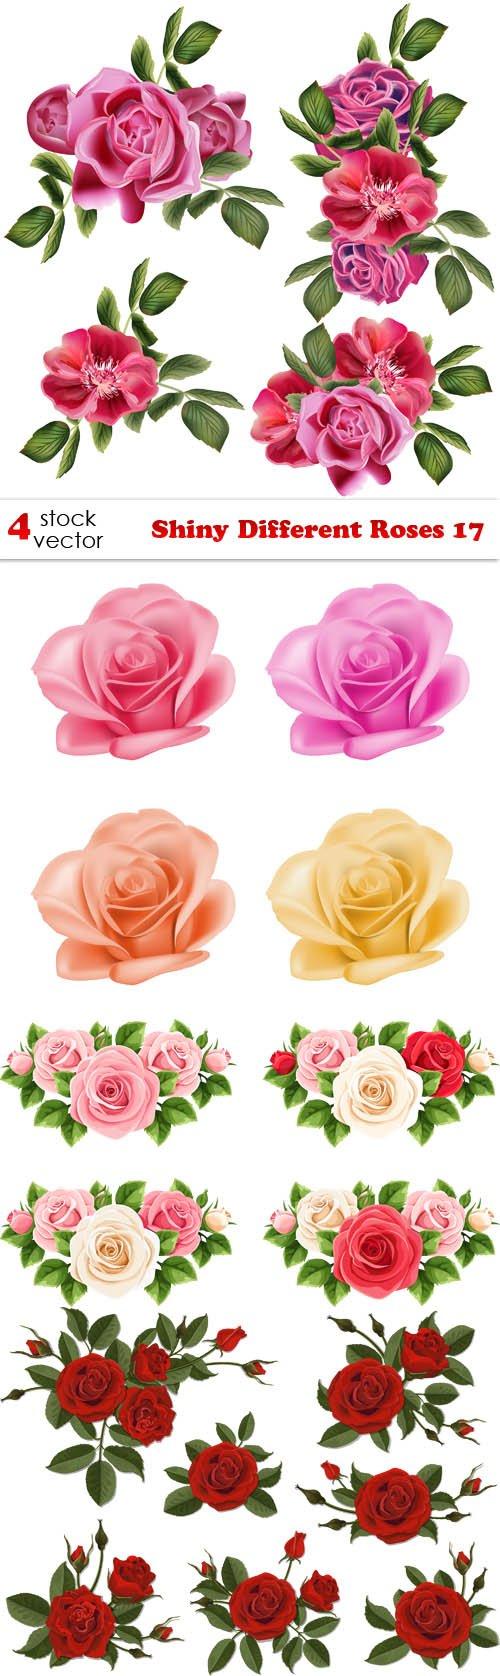 Vectors - Shiny Different Roses 17